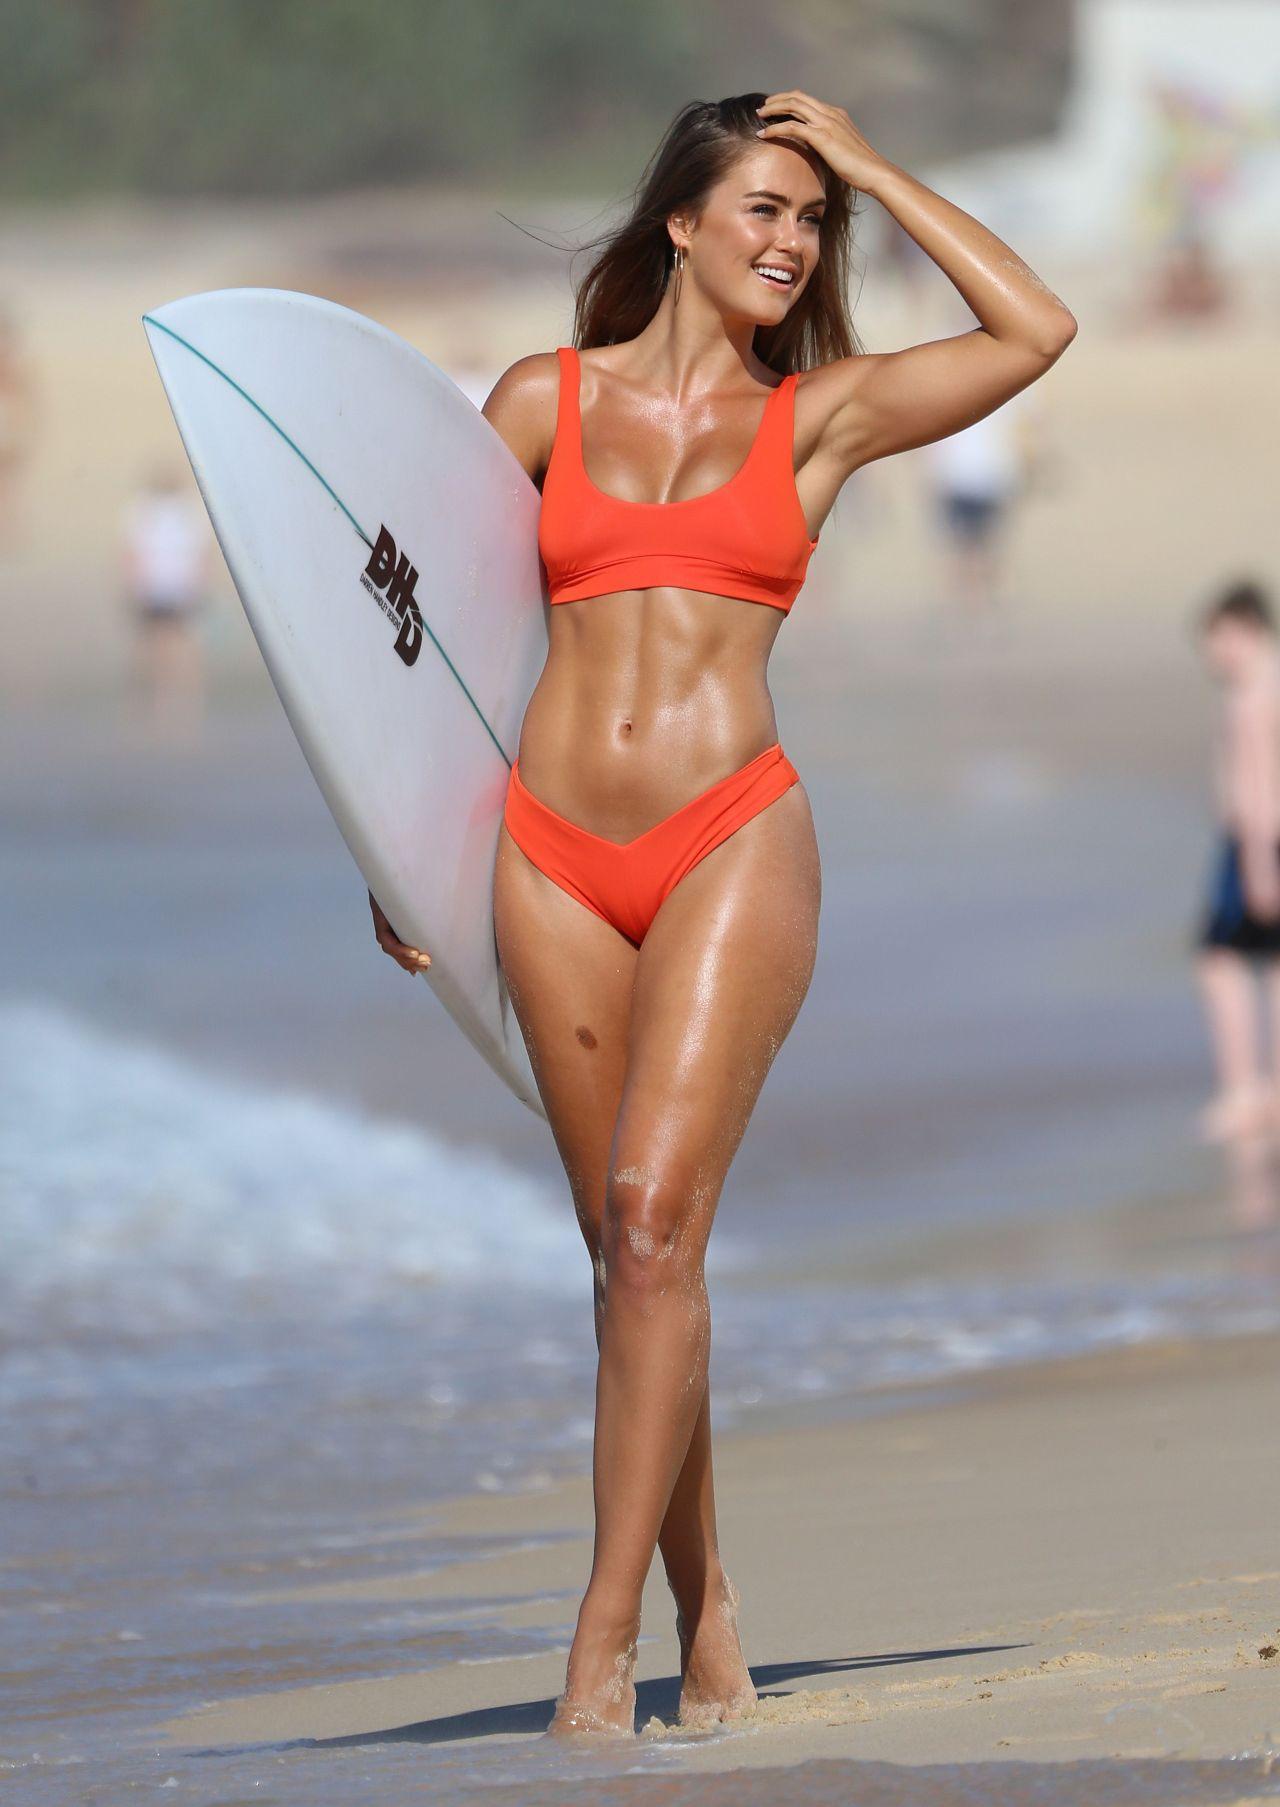 Steph Smith  Bikini Photoshoot at Bondi Beach 03292018